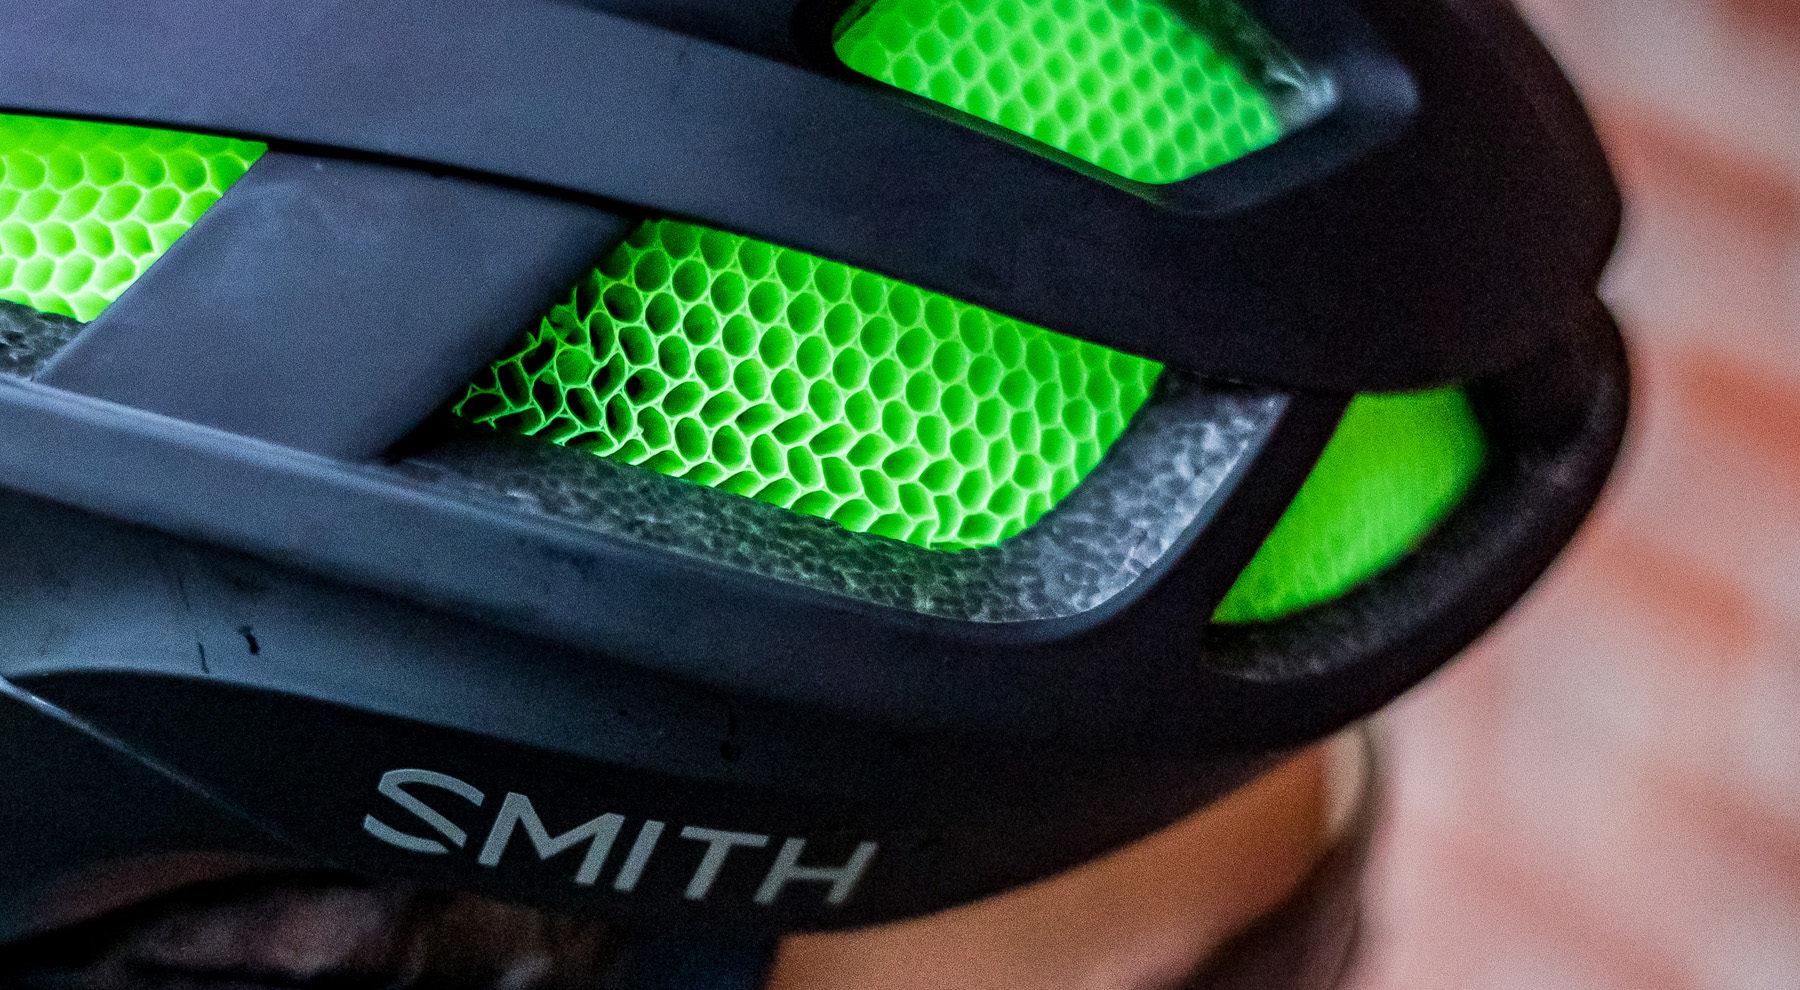 SMITH Trace Koroyd